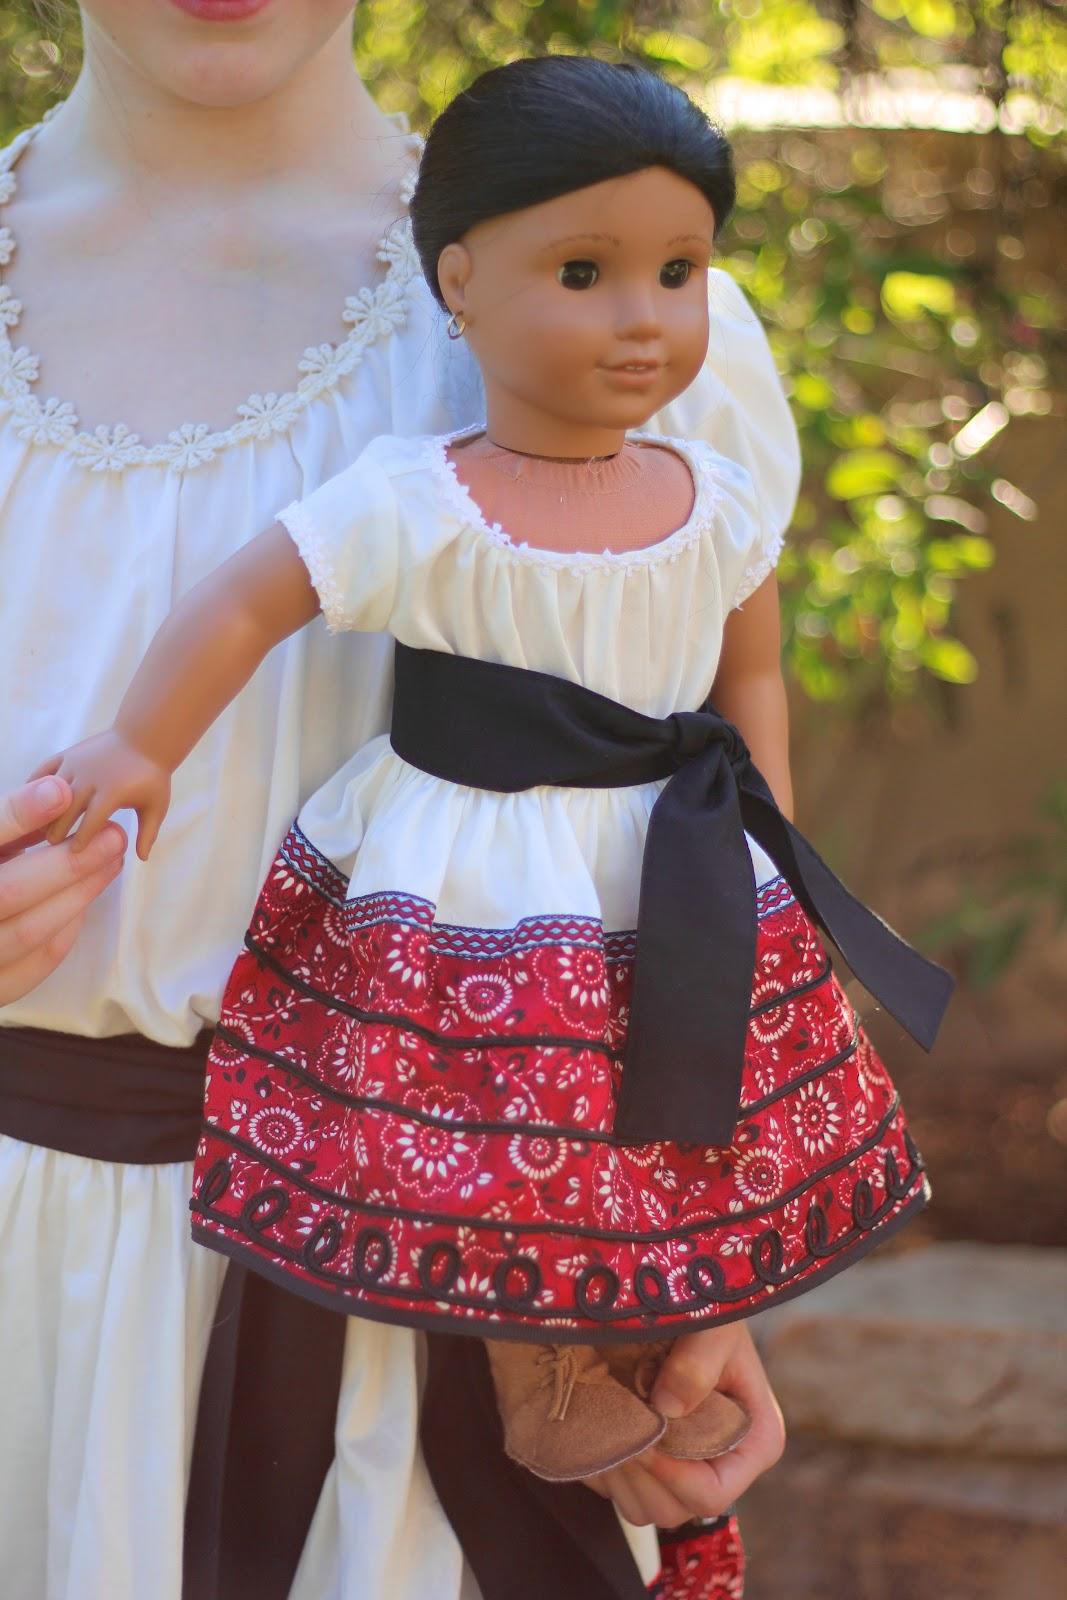 saint nolt sews american girl josefina costume. Black Bedroom Furniture Sets. Home Design Ideas